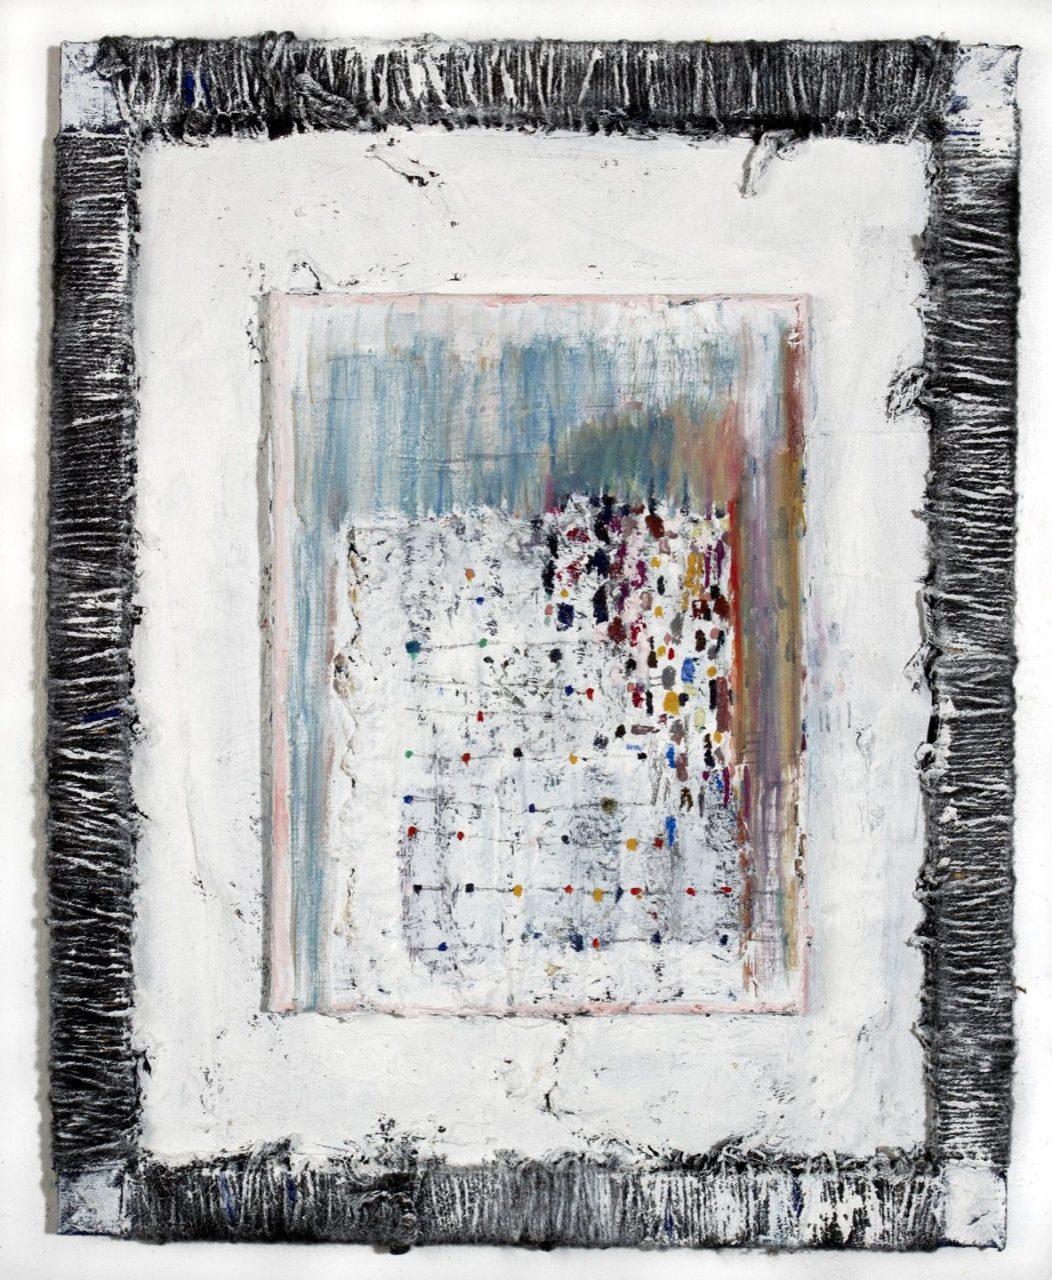 Yevgeniya Baras | Untitled, 2014